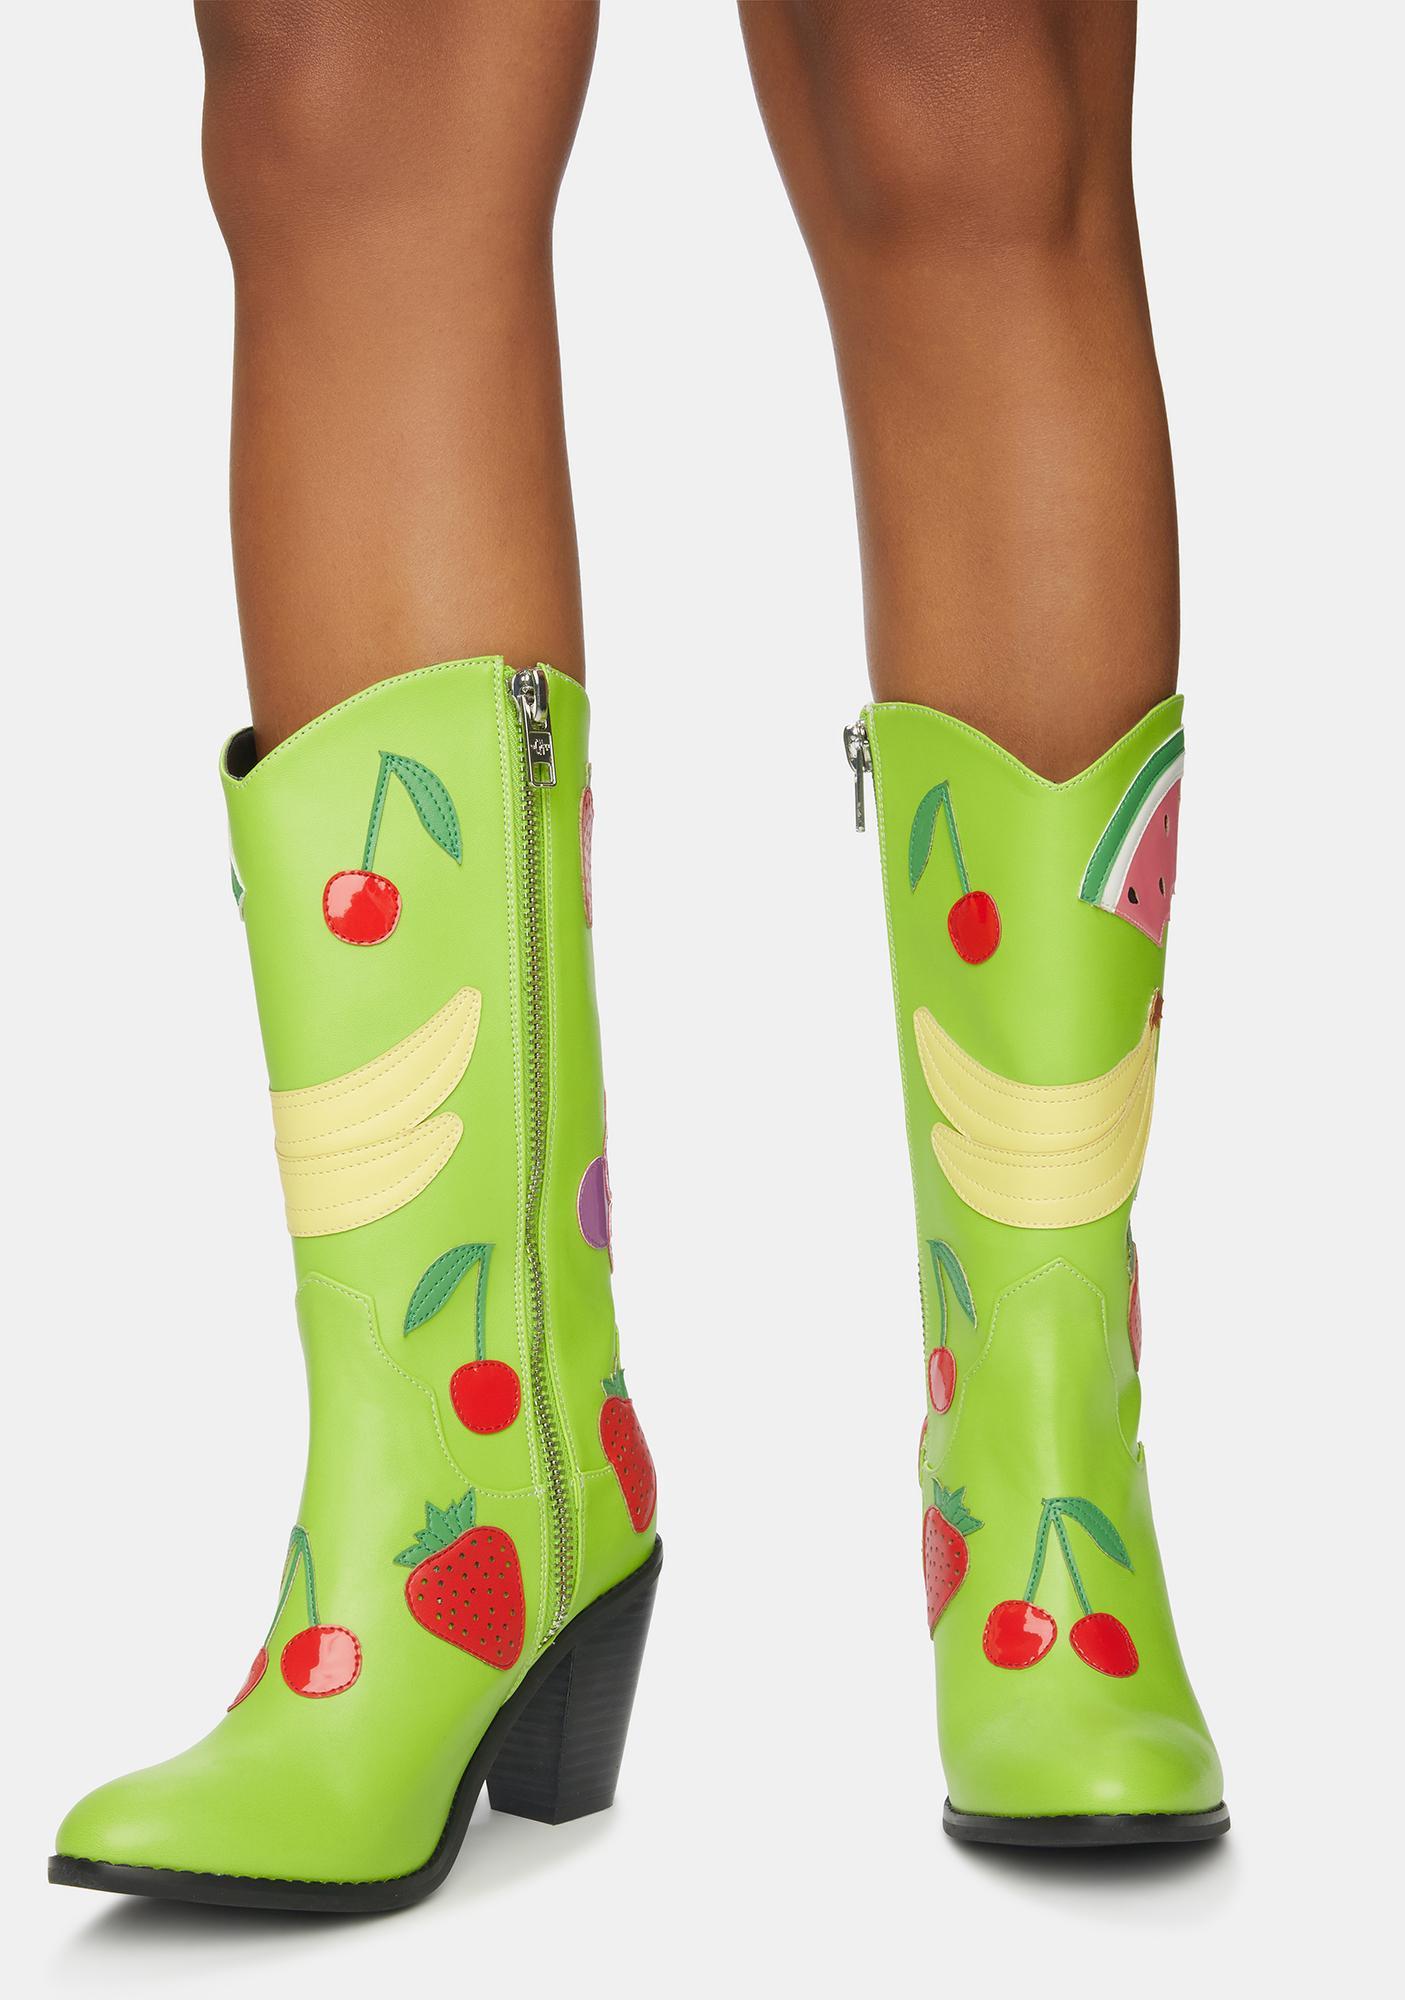 Current Mood Grapeful For You Cowboy Boots